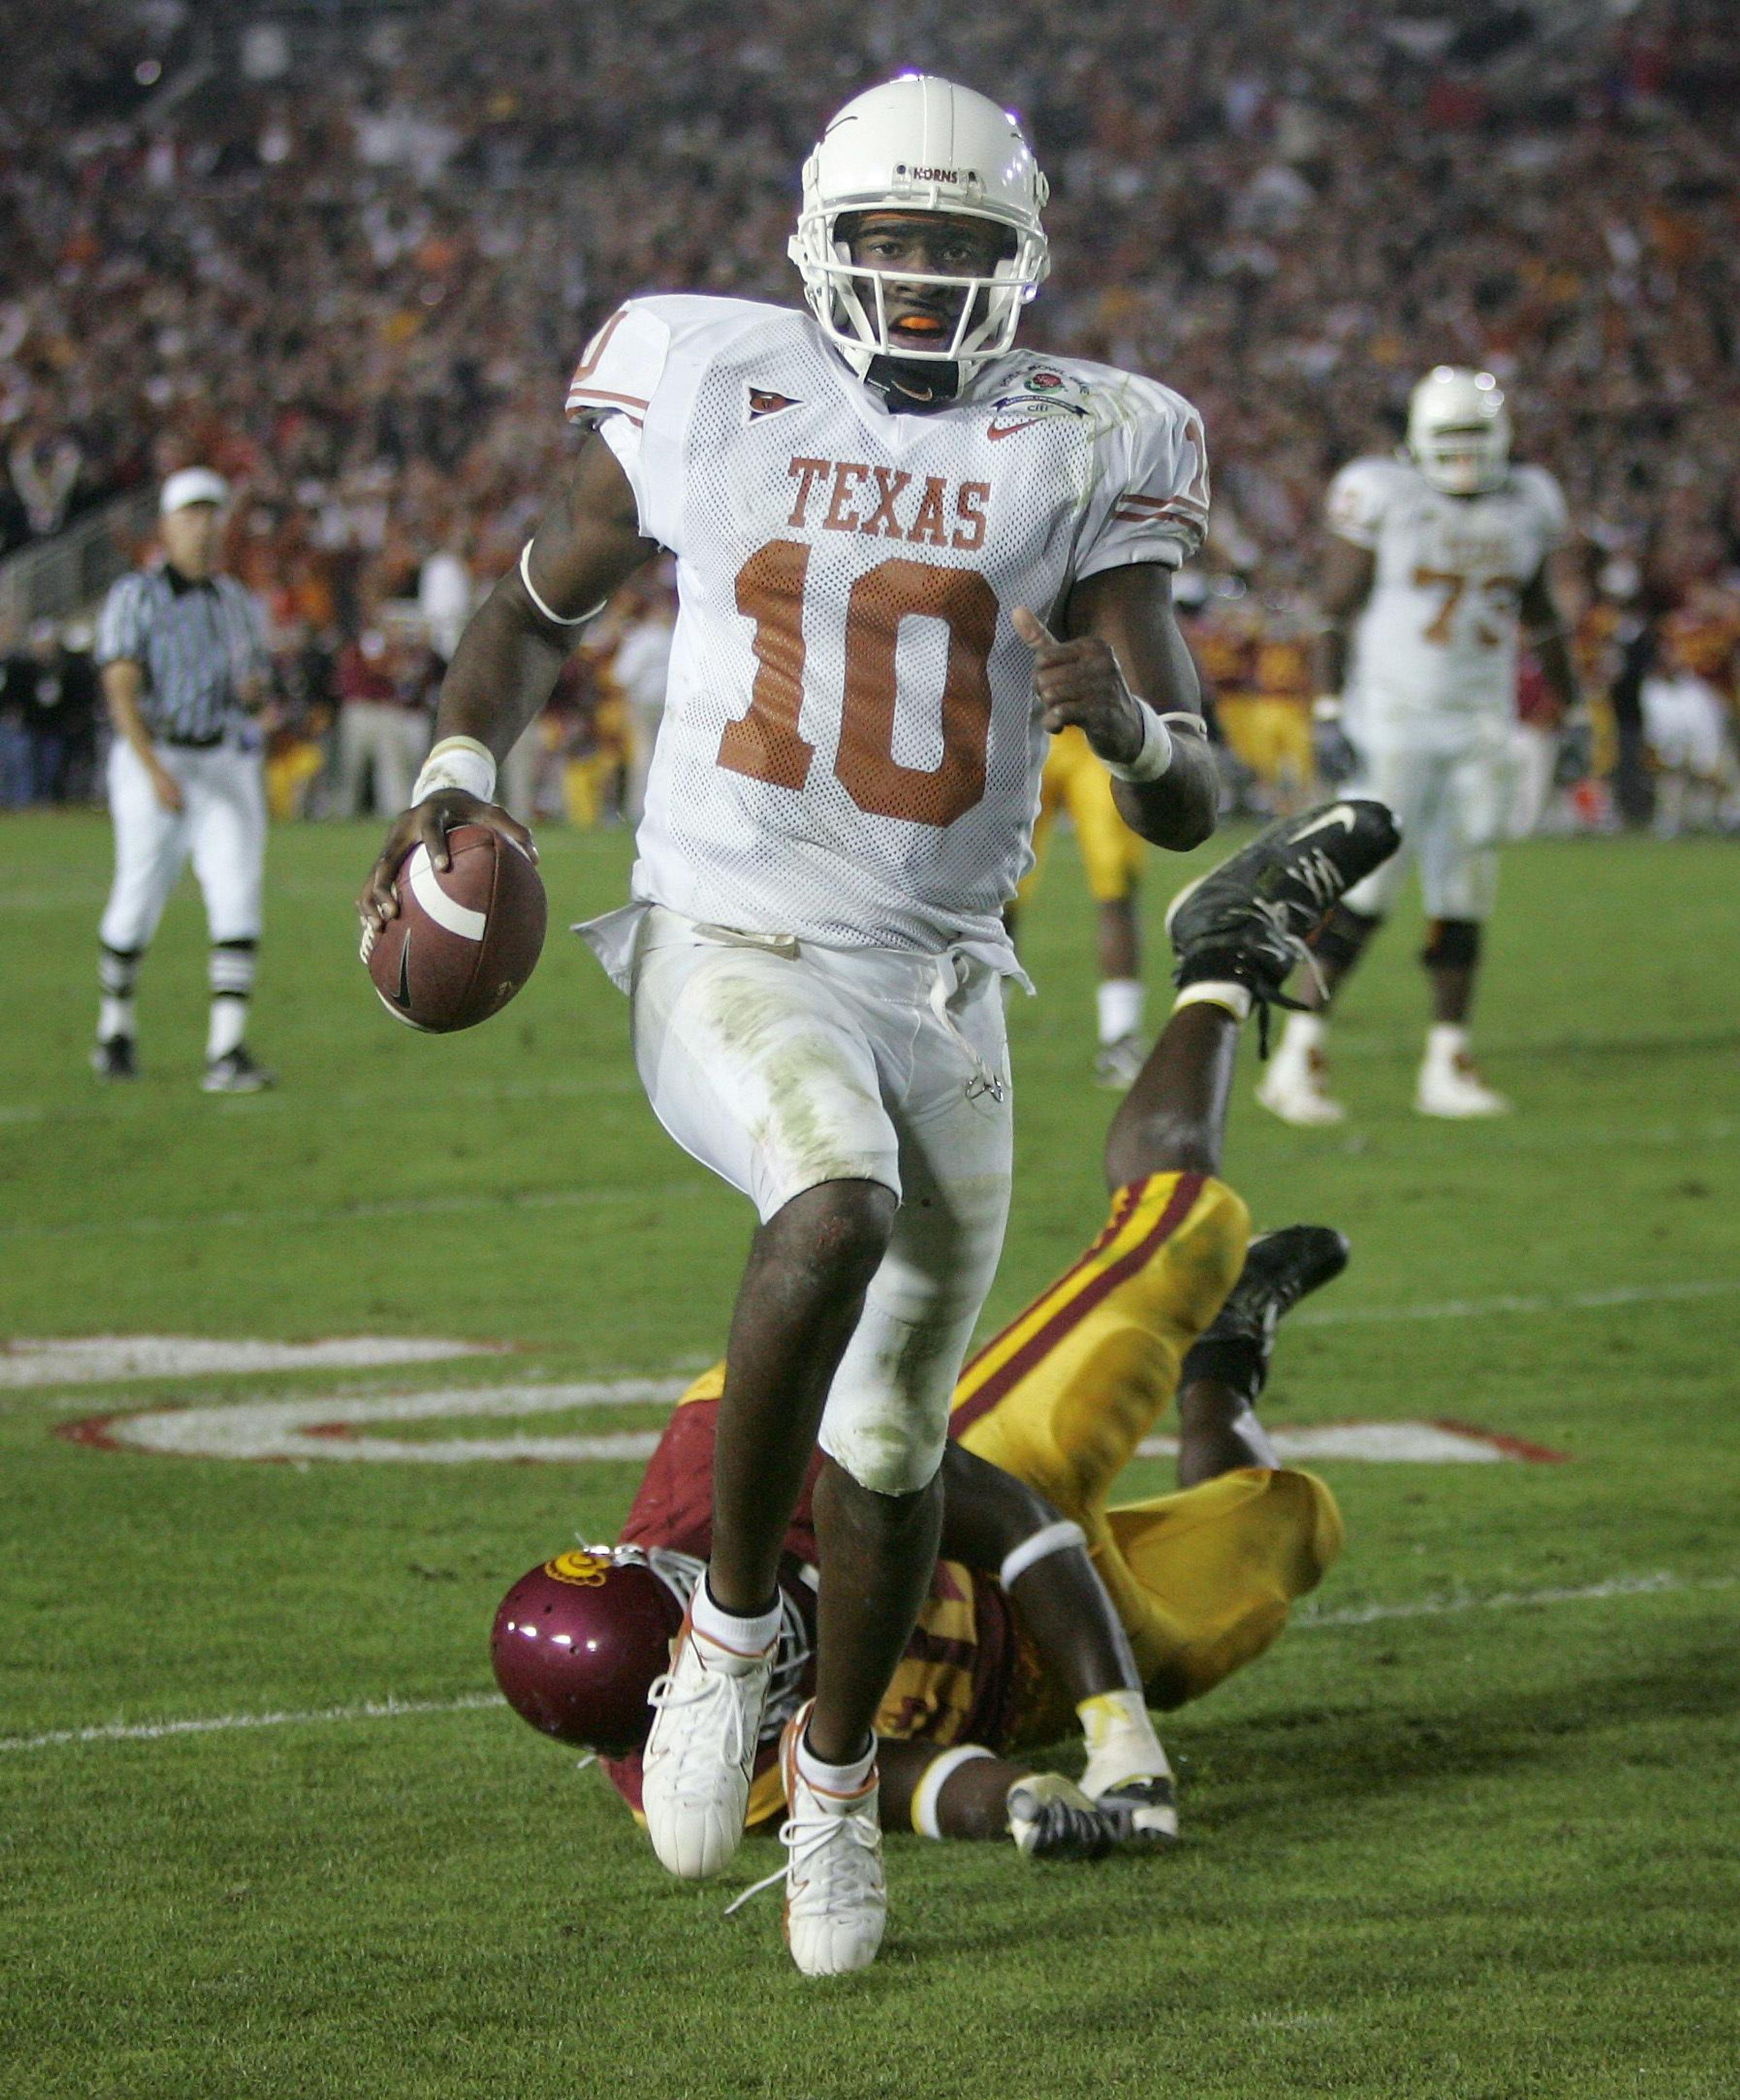 Texas_usc_greatest_game_football_13487_s3393x4096